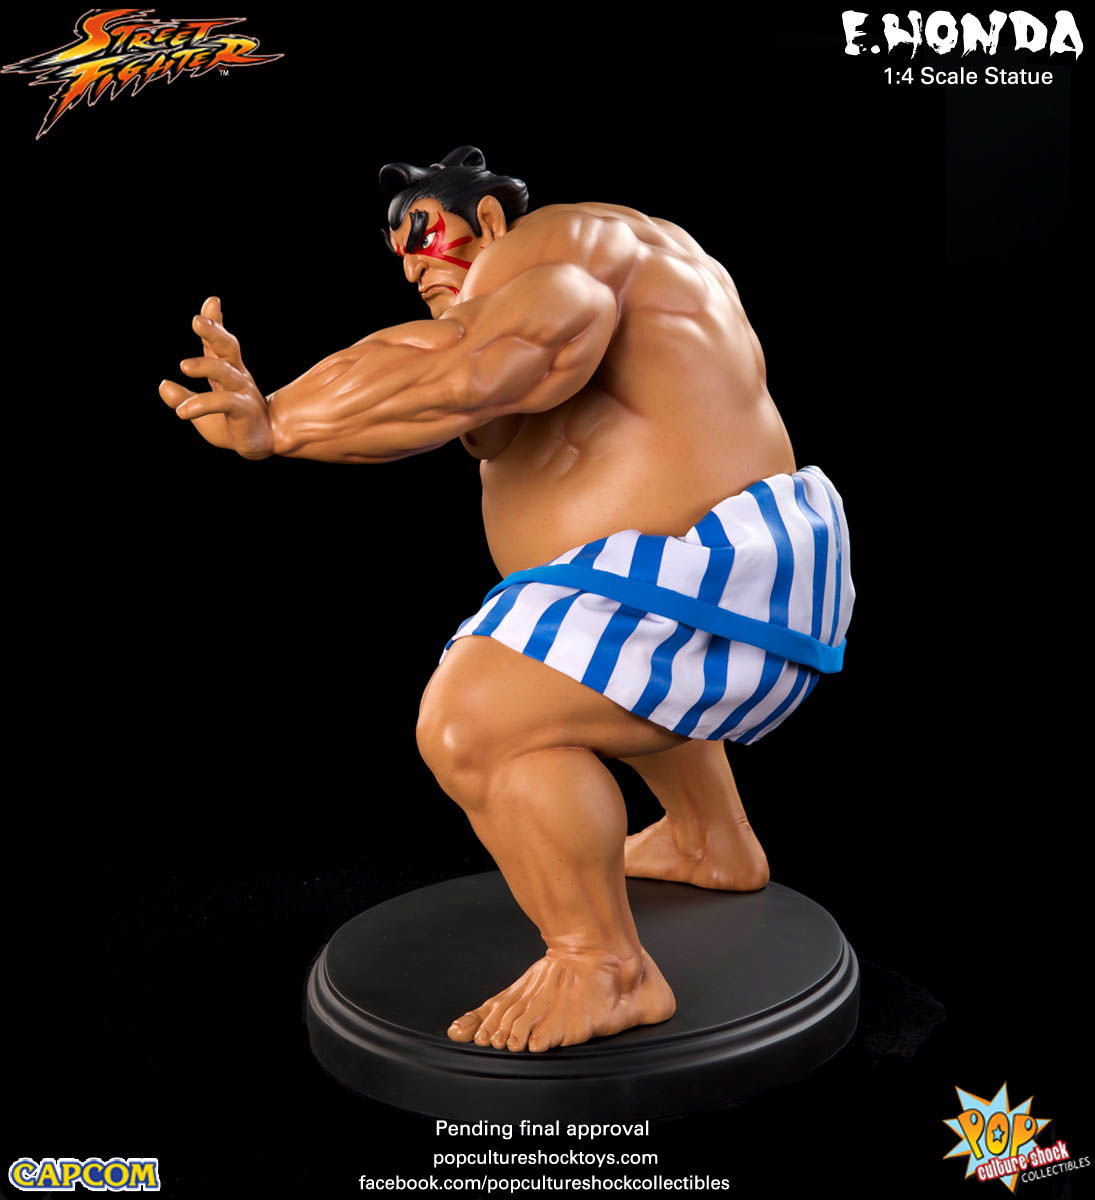 [Pop Culture Shock] Street Fighter: E. Honda 1/4 Statue - Página 3 Street-Fighter-E.-Honda-Regular-Statue-008